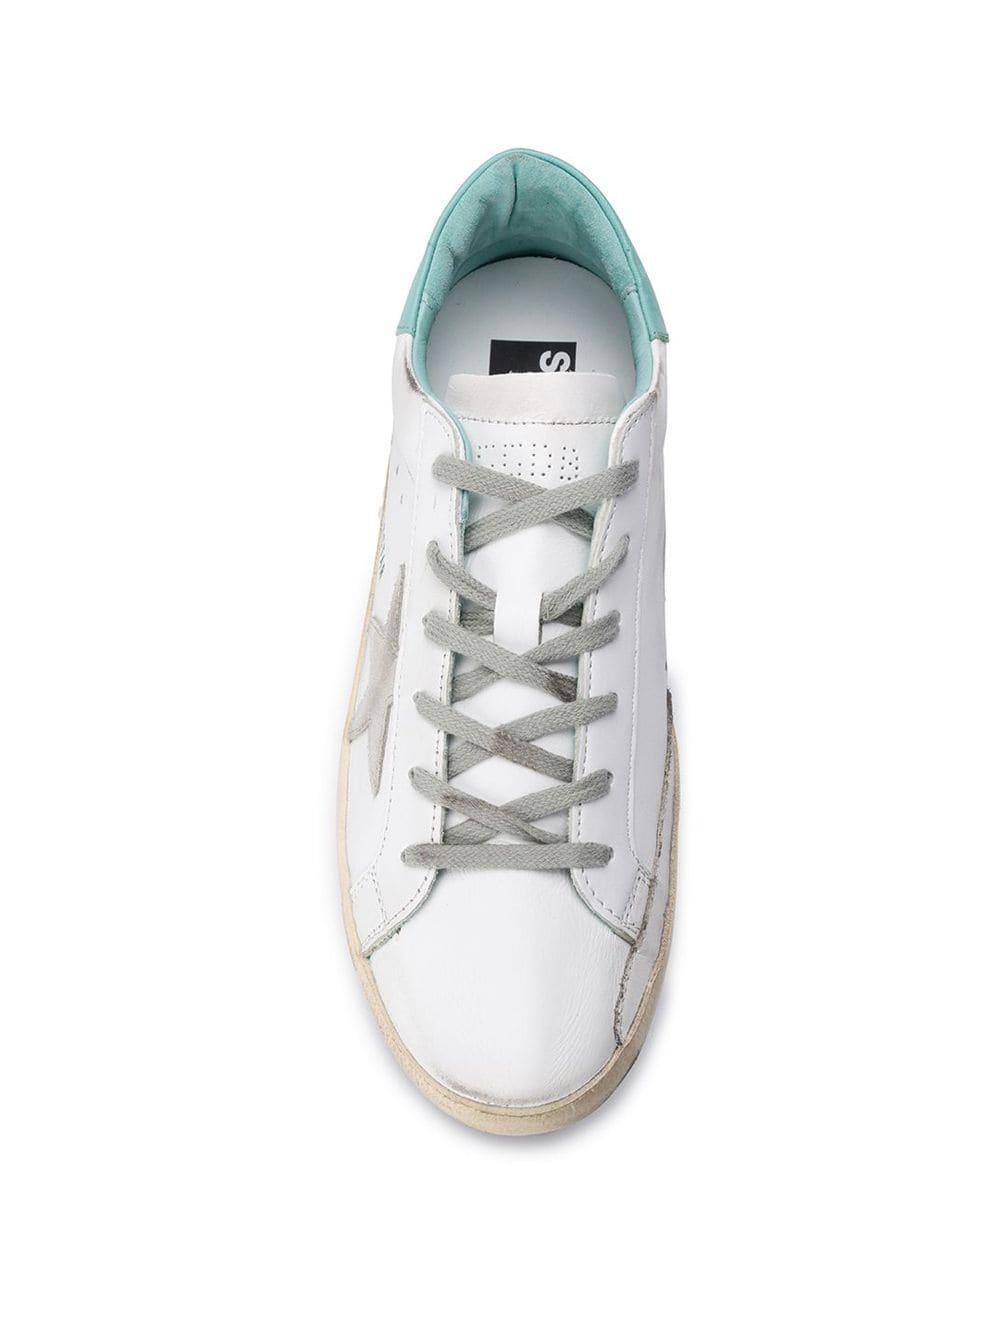 Zapatillas Superstar Golden Goose Deluxe Brand de Pluma de oca de color Blanco